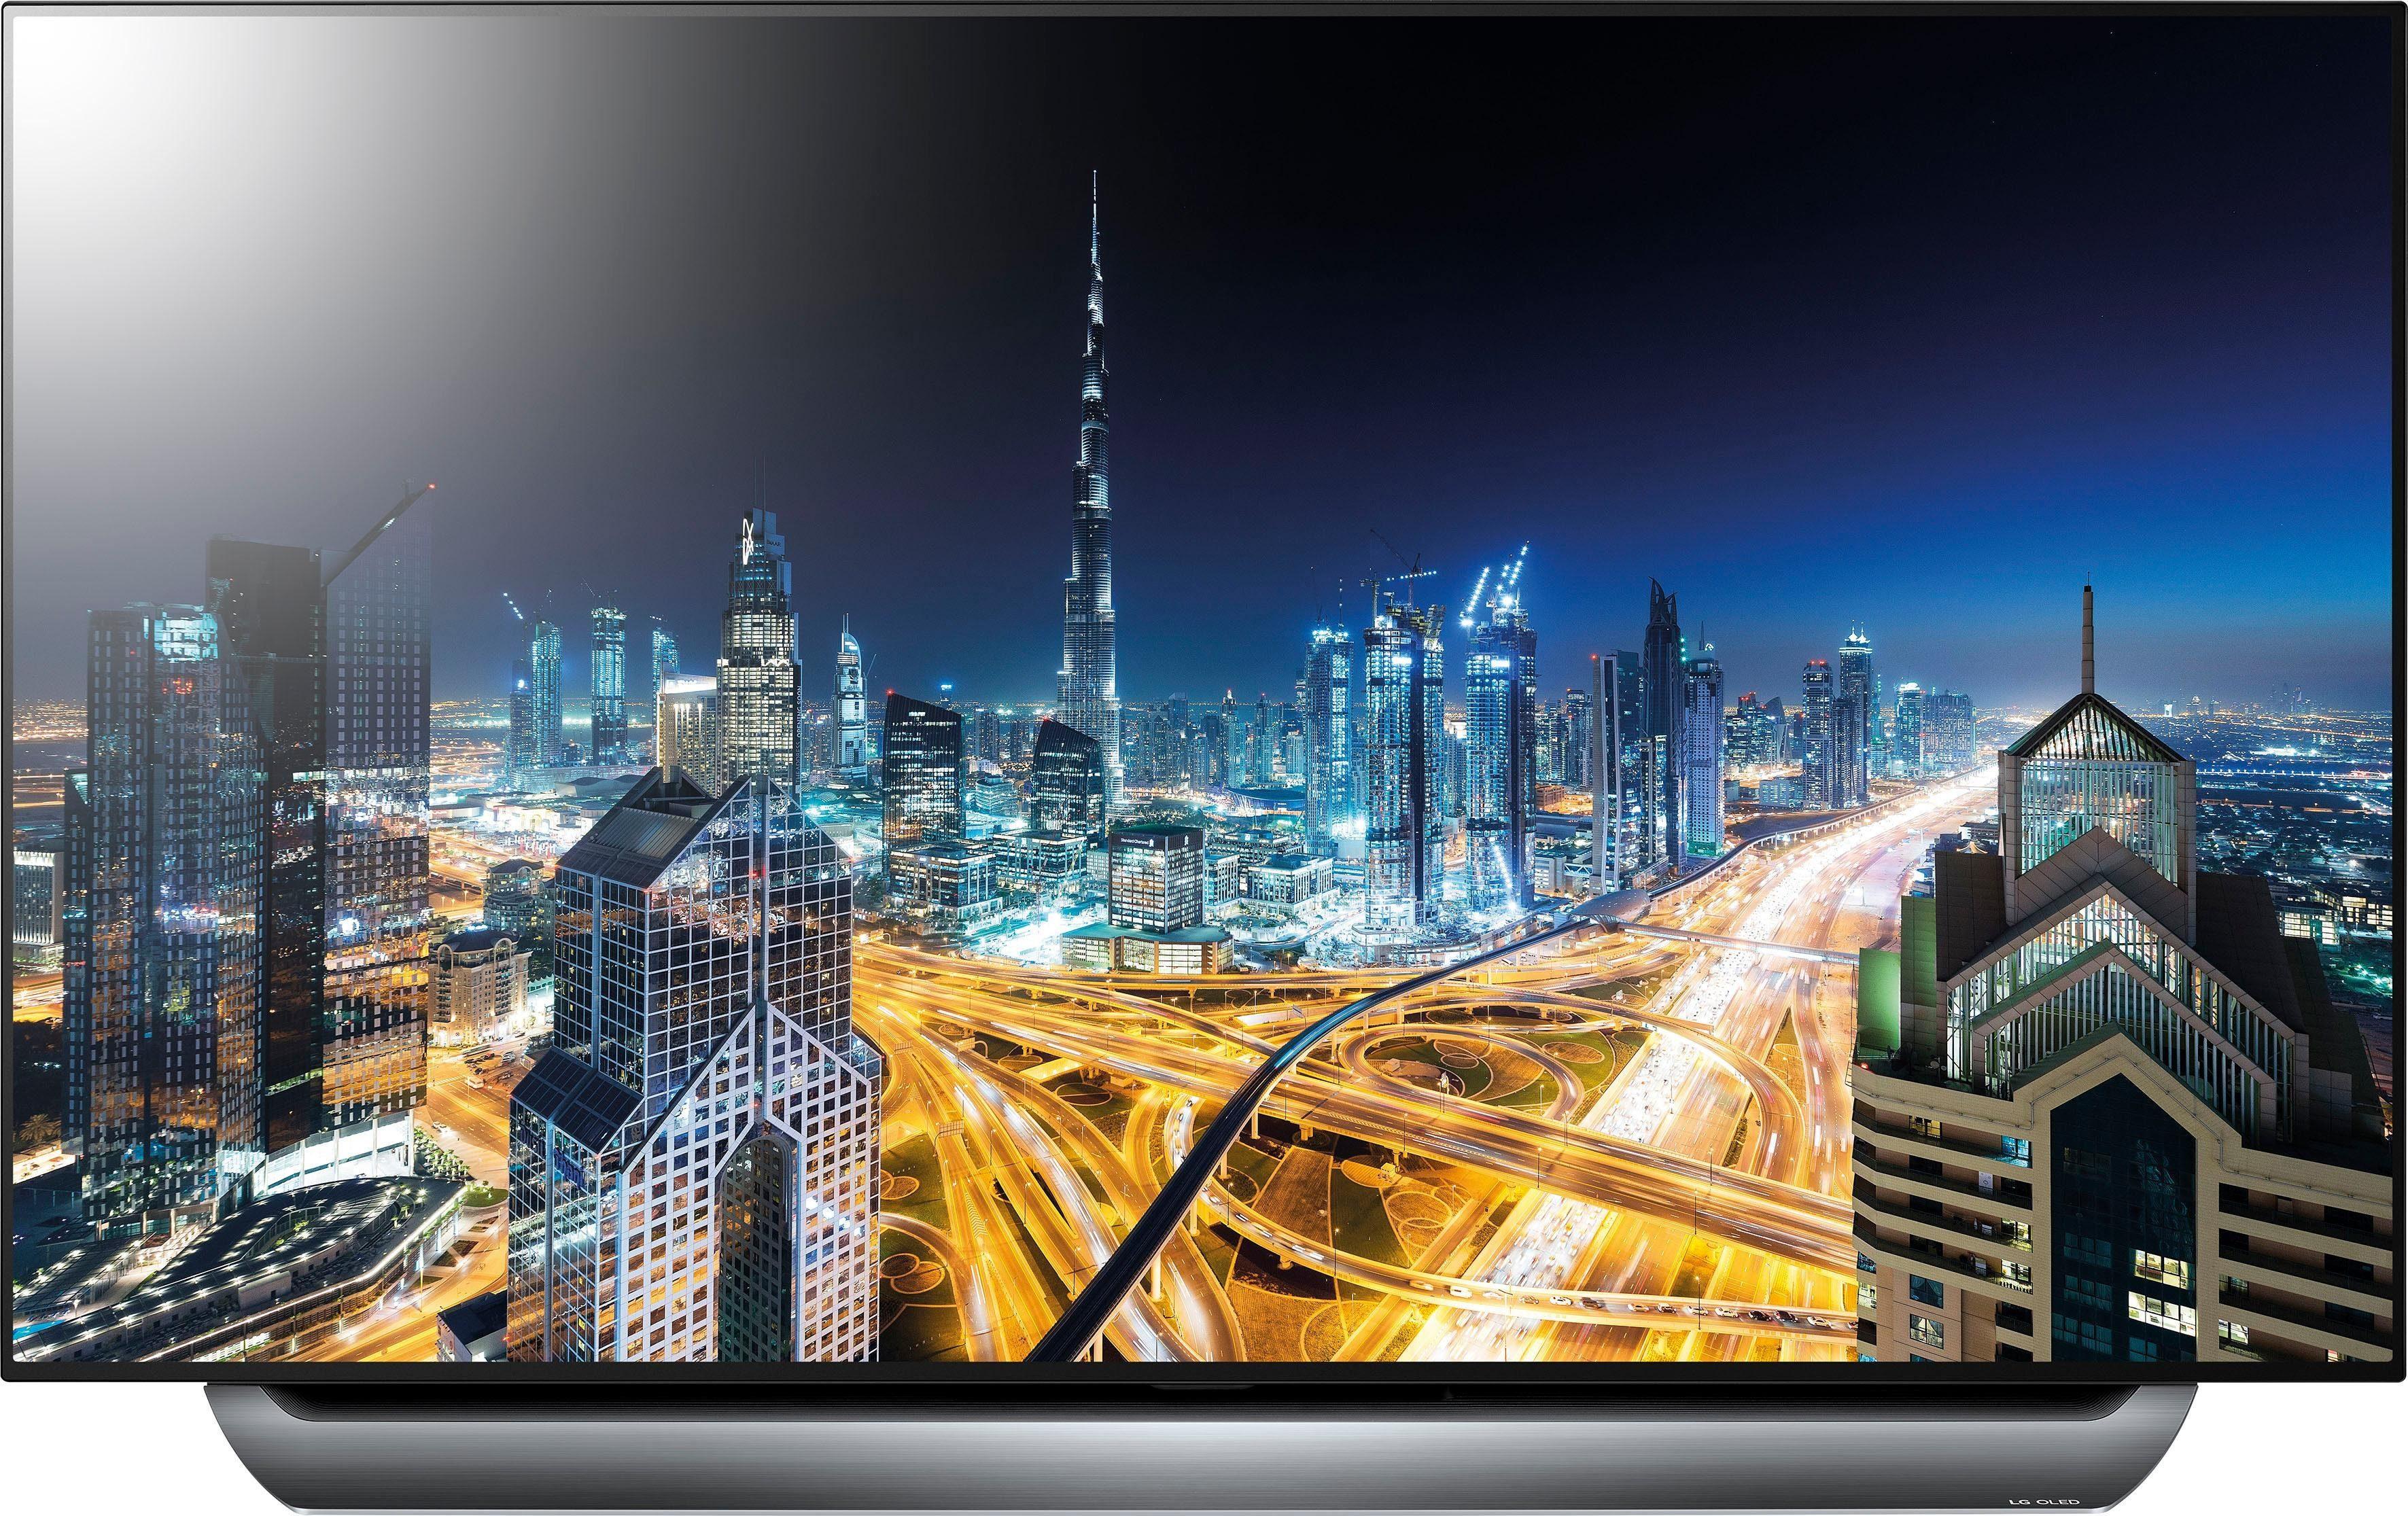 LG OLED55C8LLA.AEU OLED-Fernseher (139 cm/55 Zoll, 4K Ultra HD, Smart-TV)